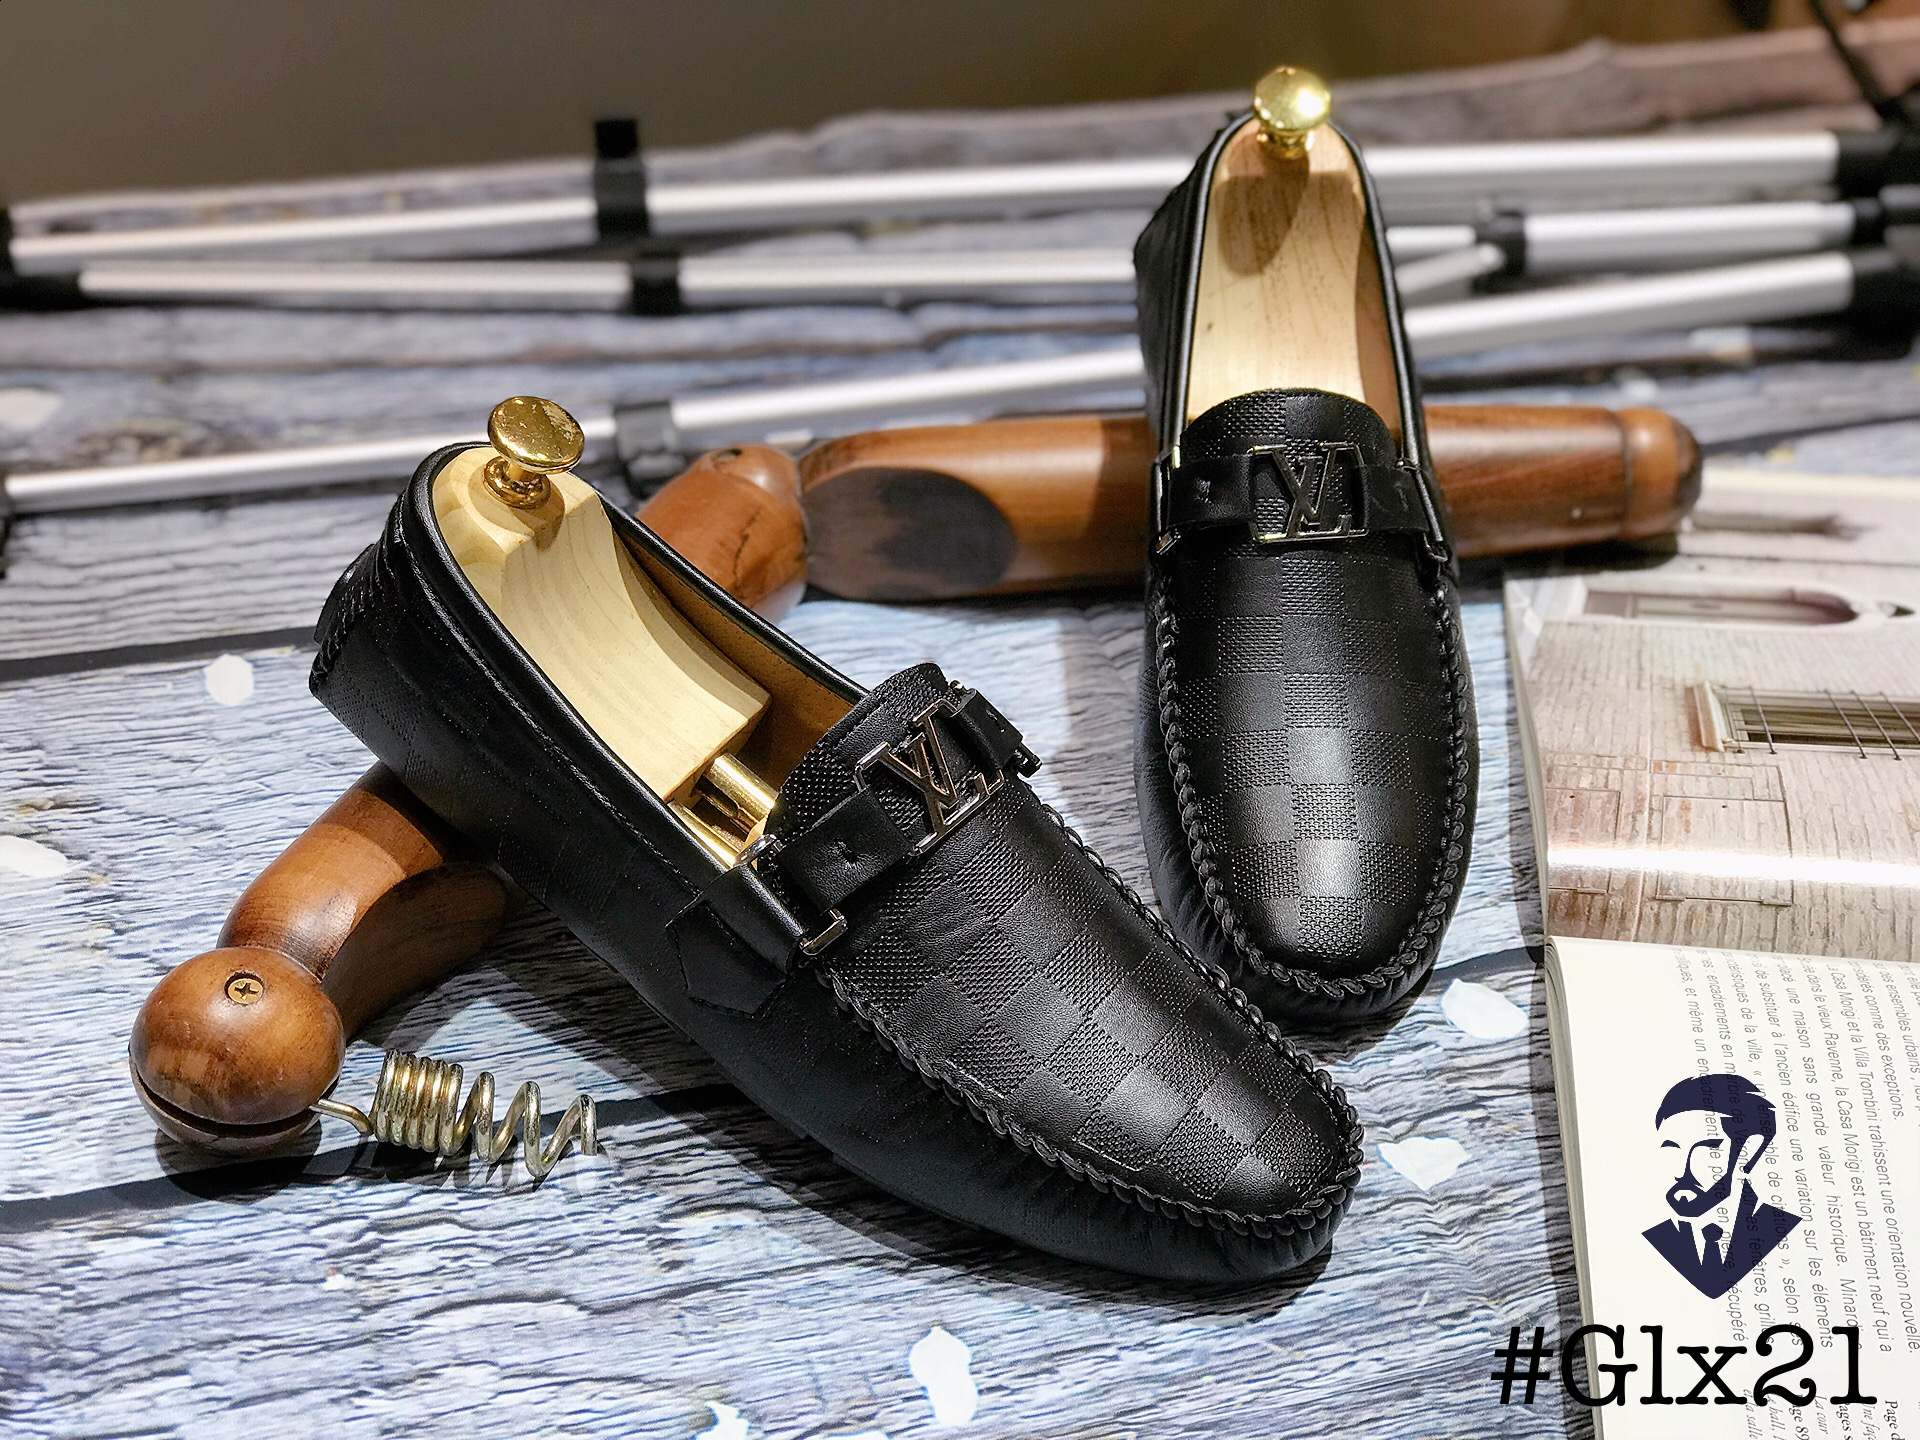 Giày lười glx21